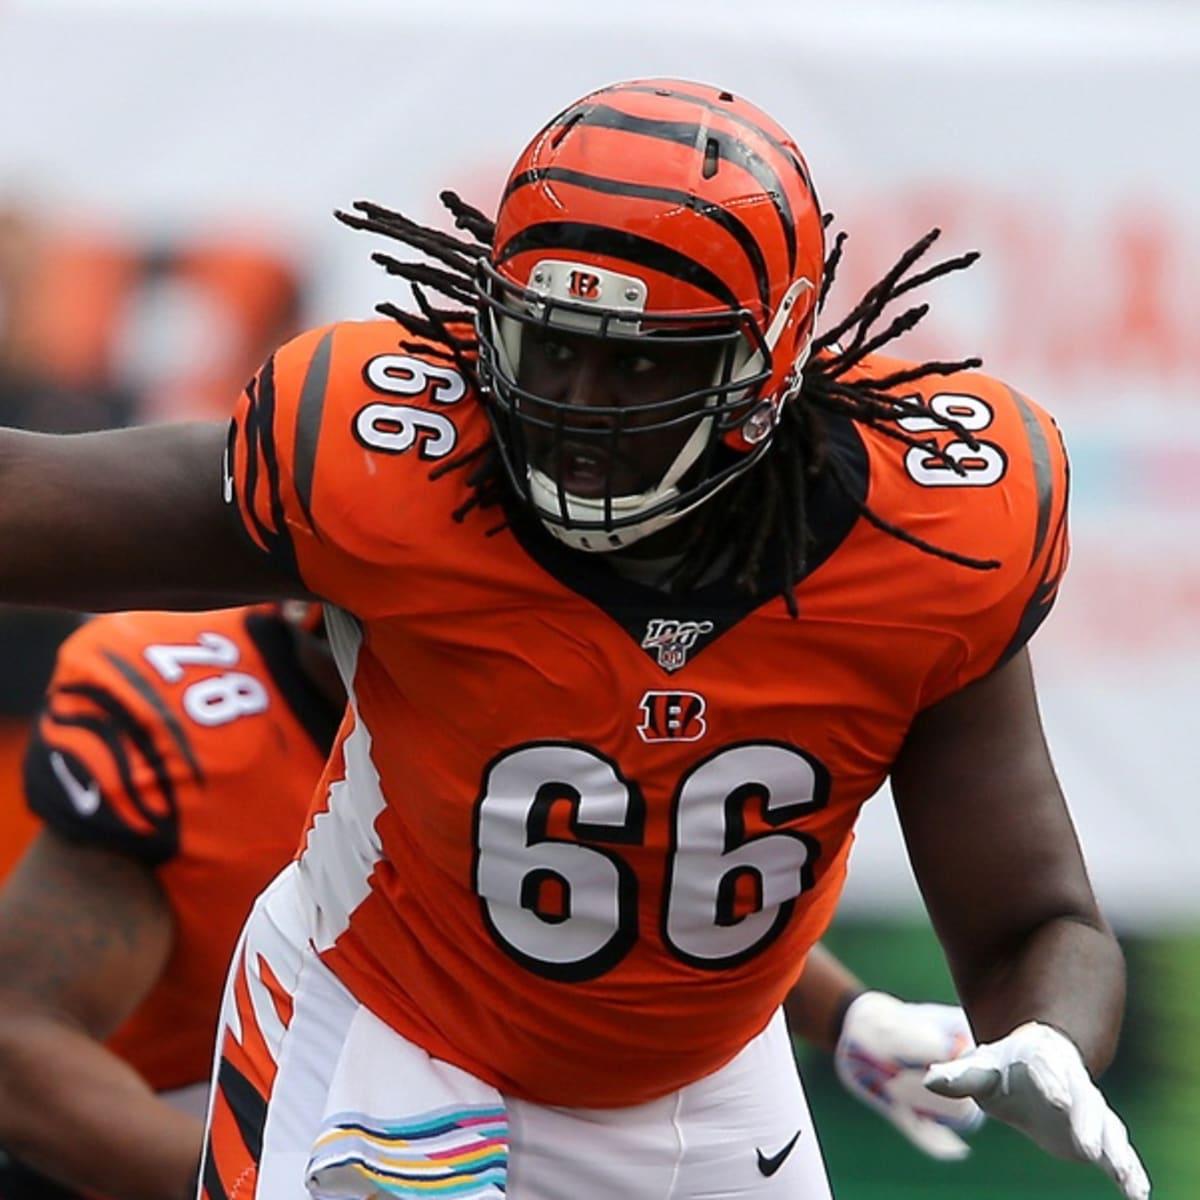 Joe Burrow's already leading for Cincinnati Bengals